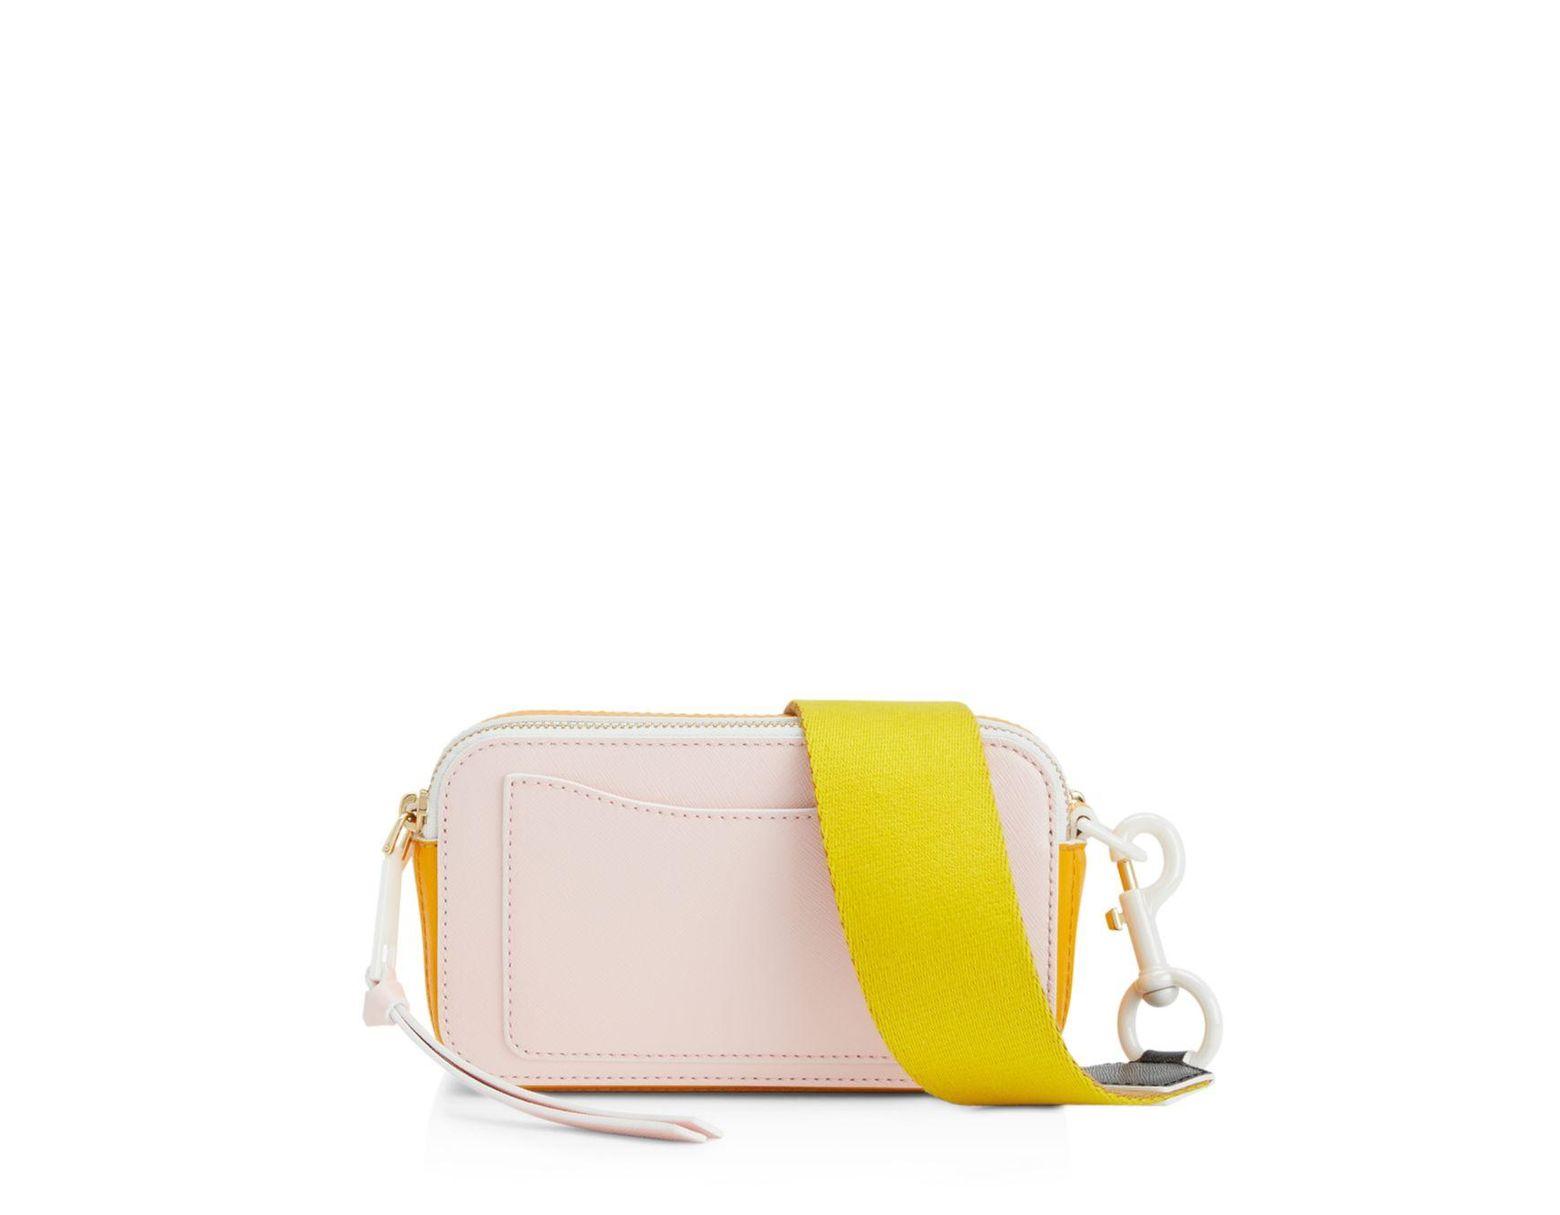 1e2a5f7faa0 Marc Jacobs Snapshot Ceramic Leather Crossbody - Lyst